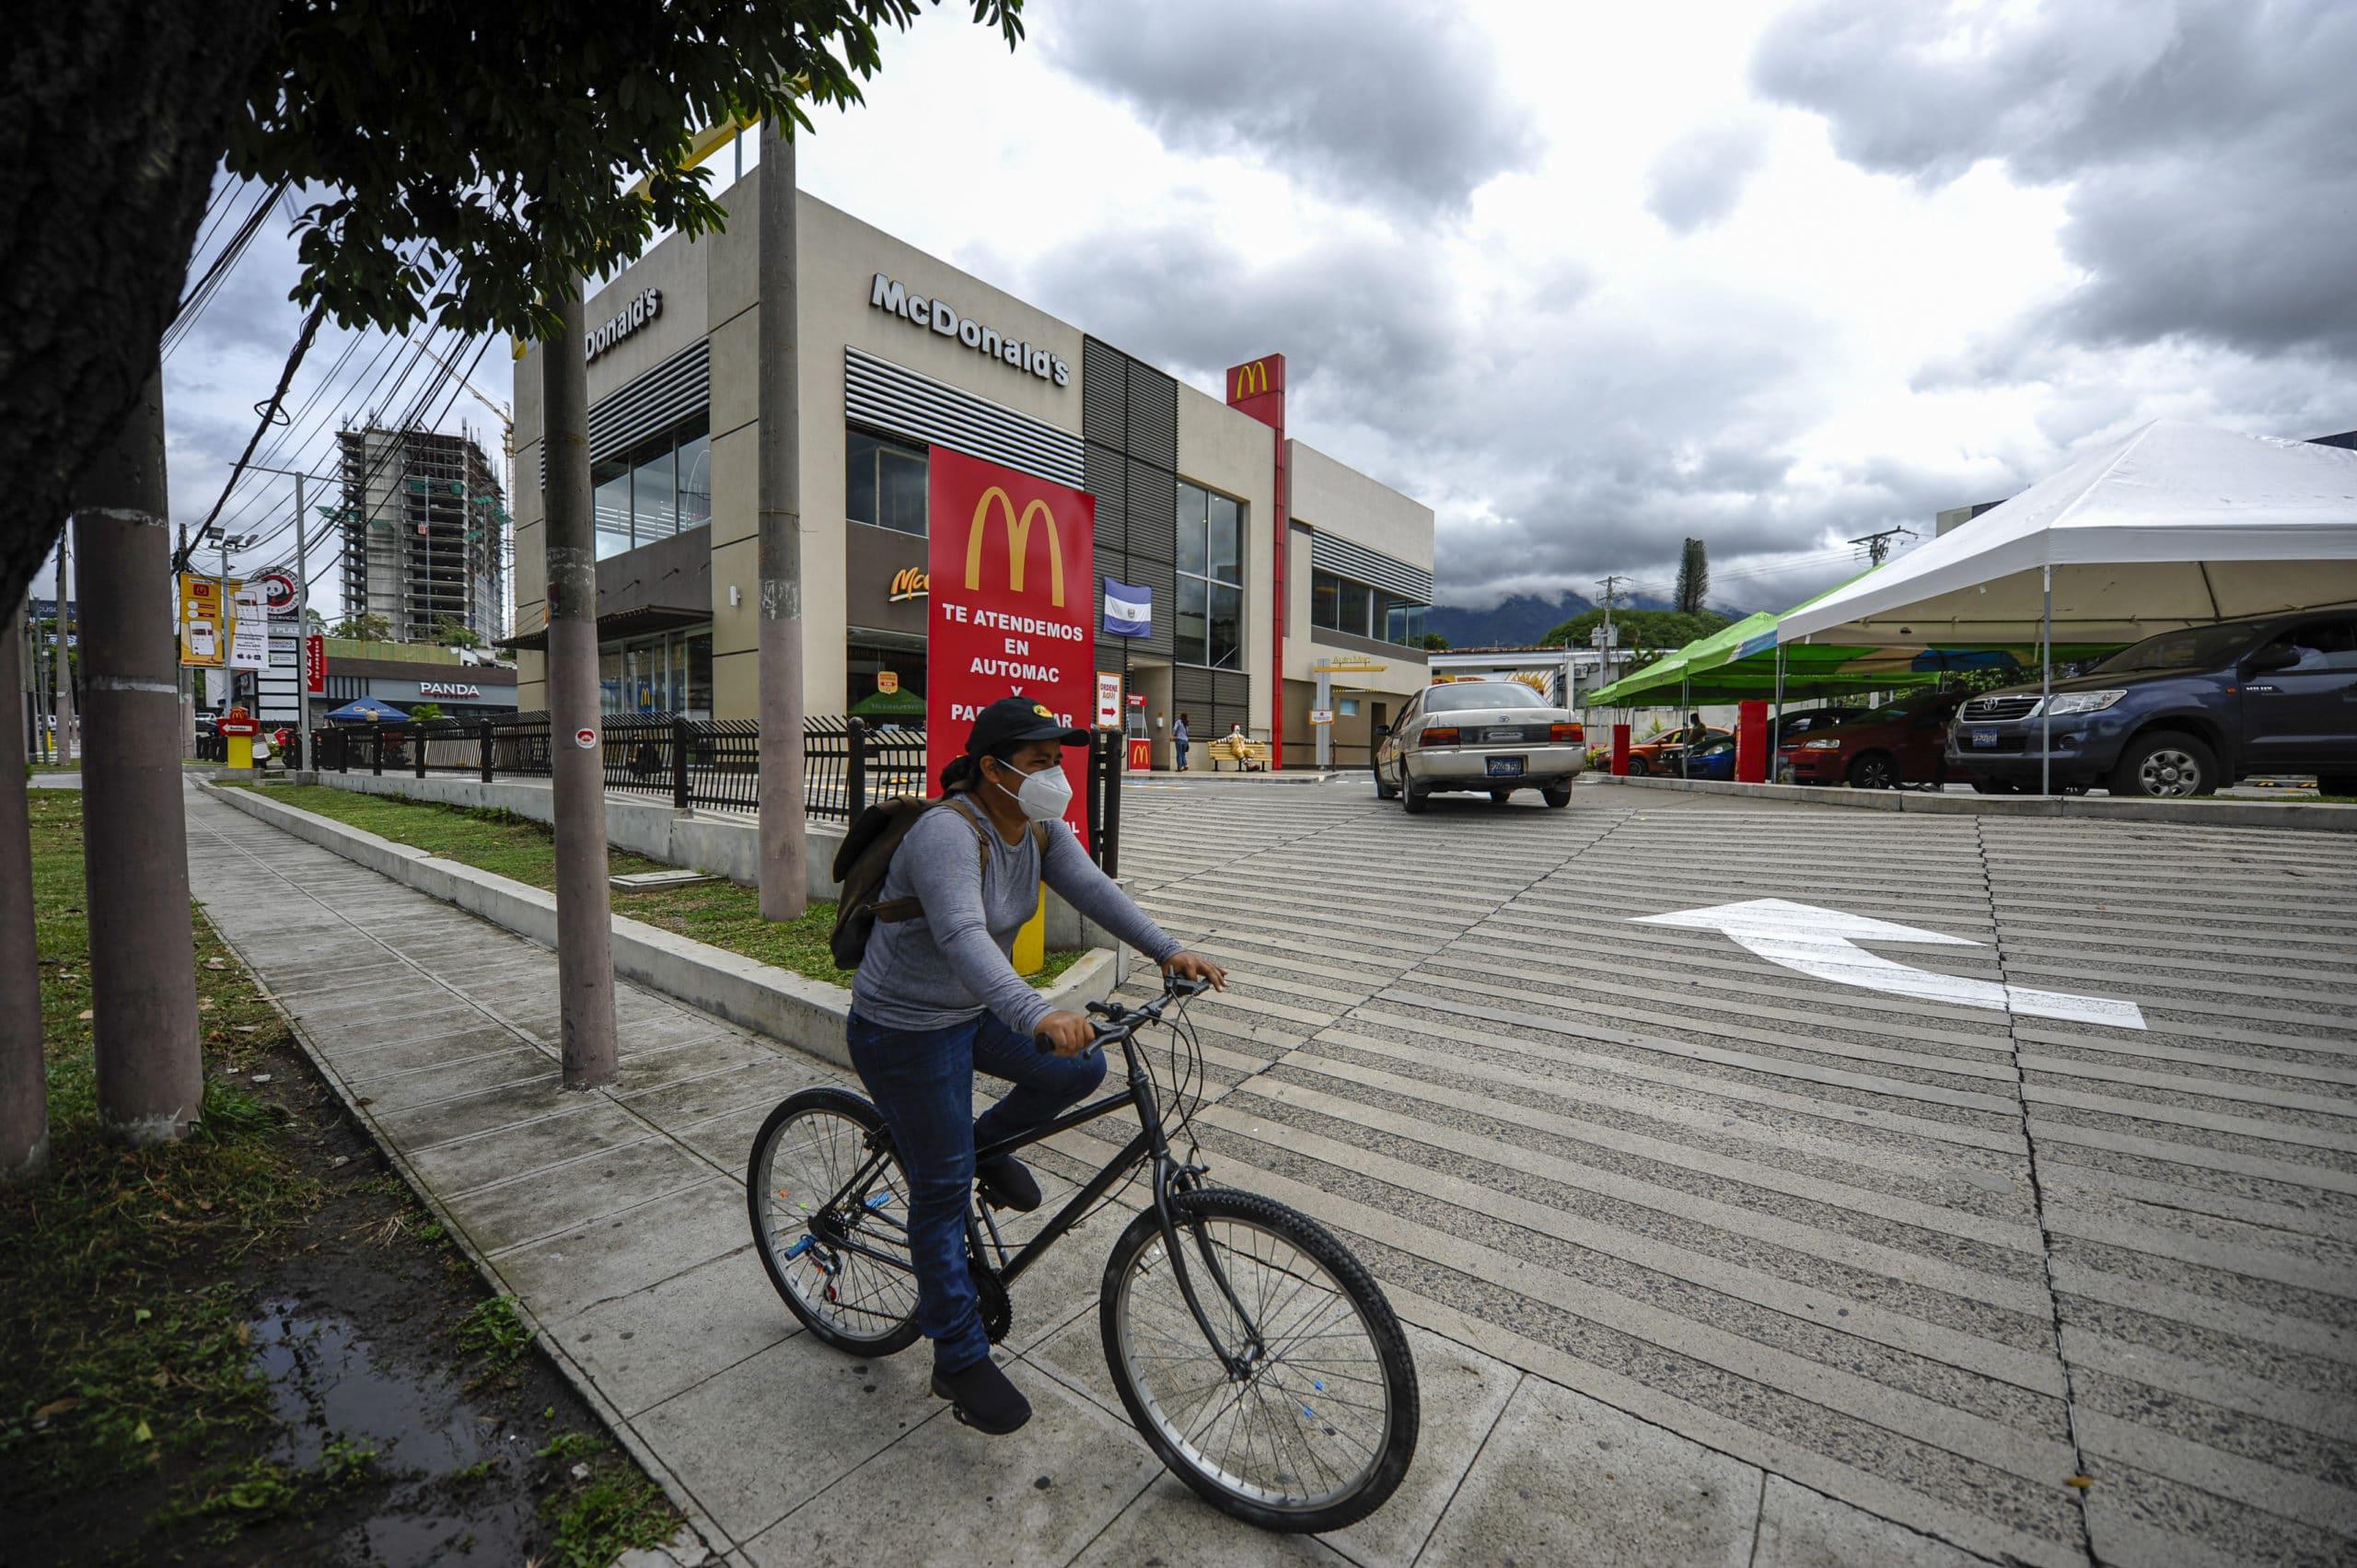 El Salvador Sells $1 Billion In Bonds To Help Fight Pandemic Spread